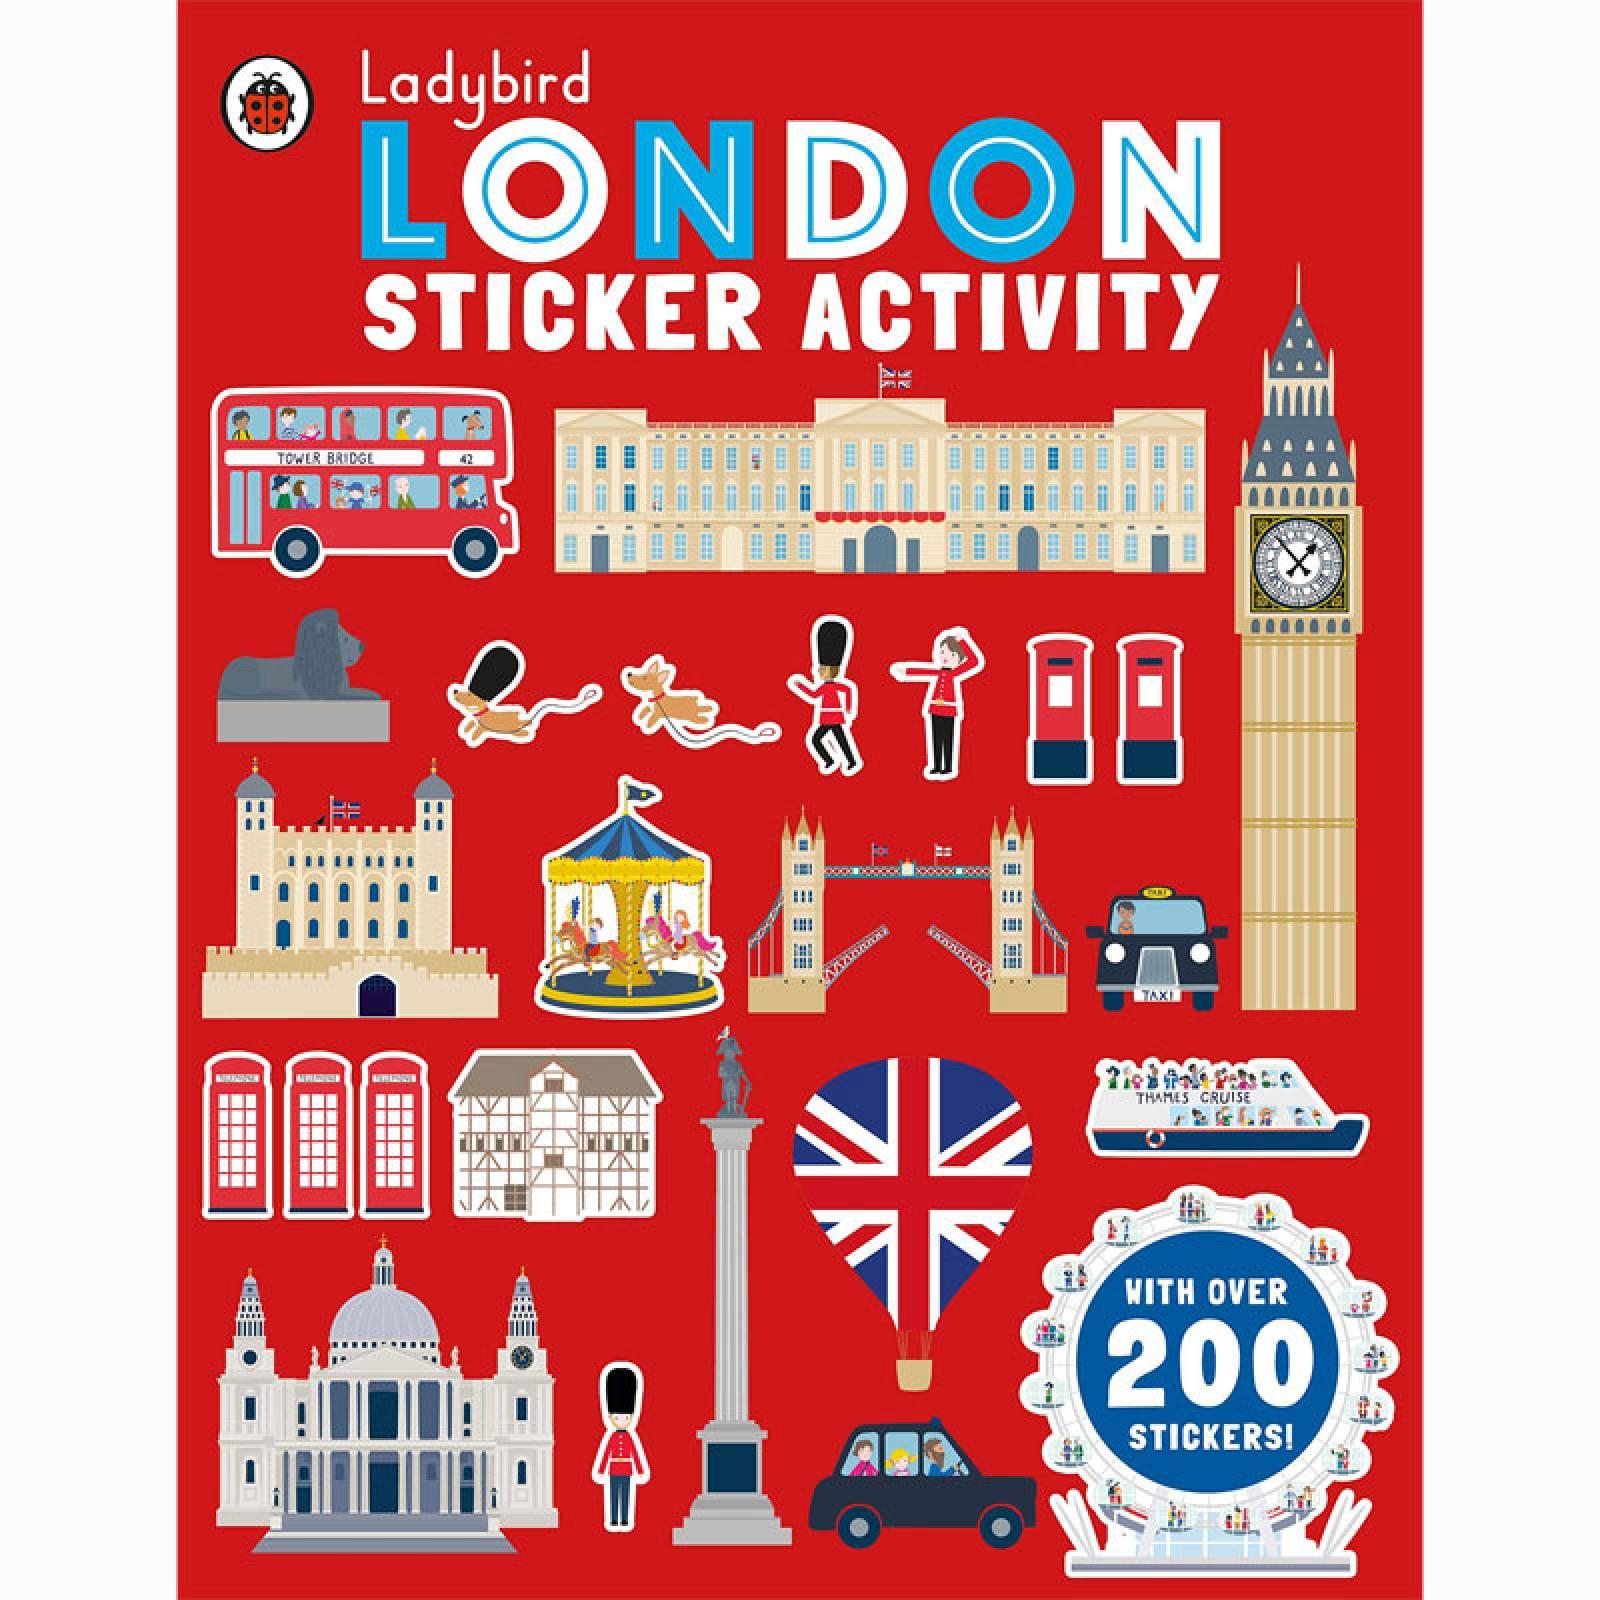 Ladybird London Sticker Activity Book